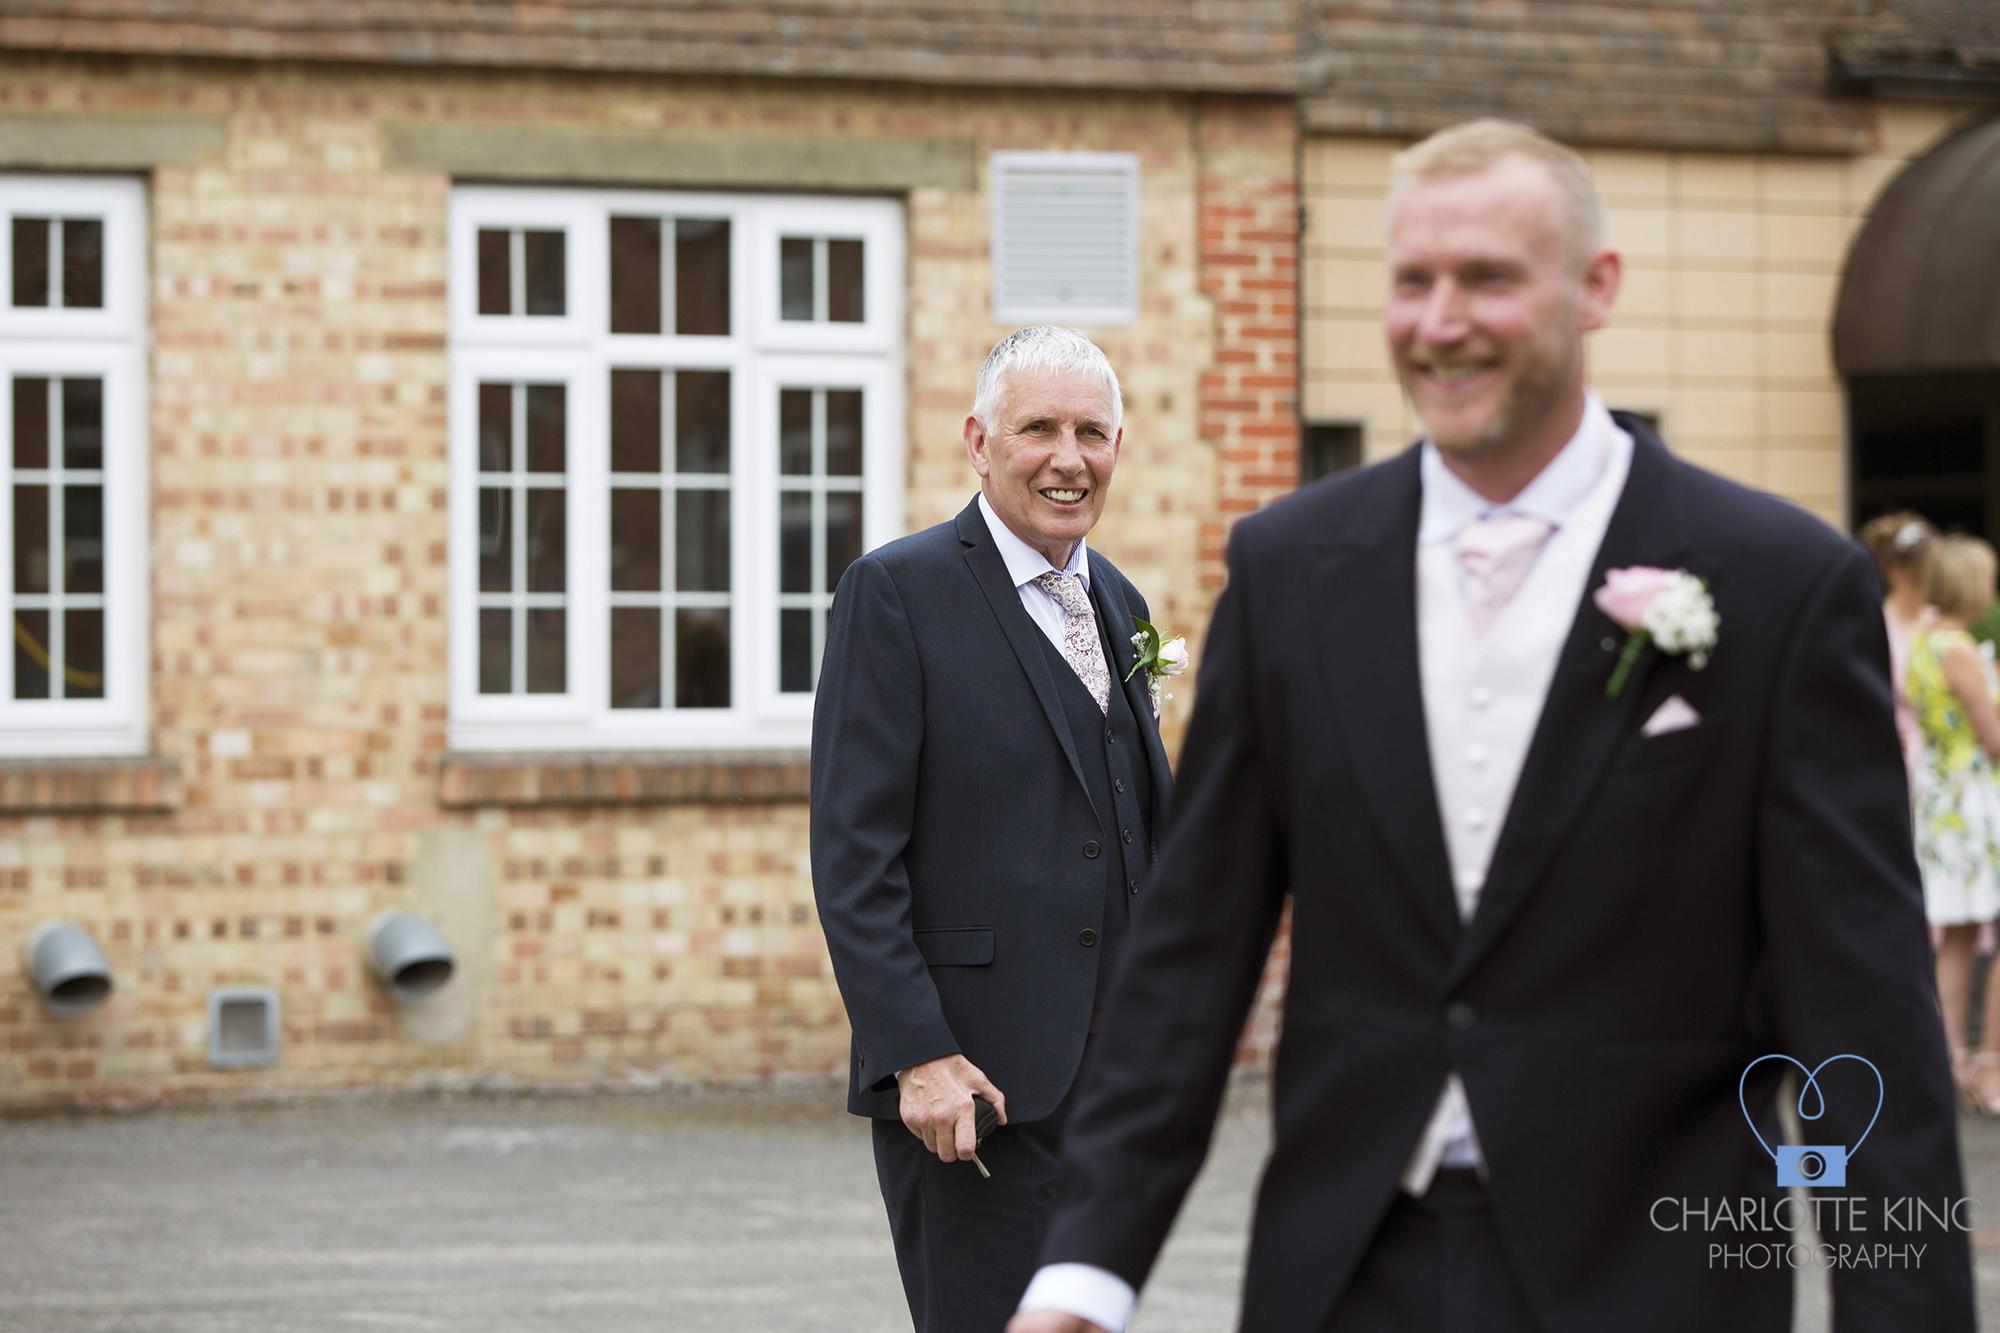 Woldingham-school-wedding-charlotte-king-photography (12)